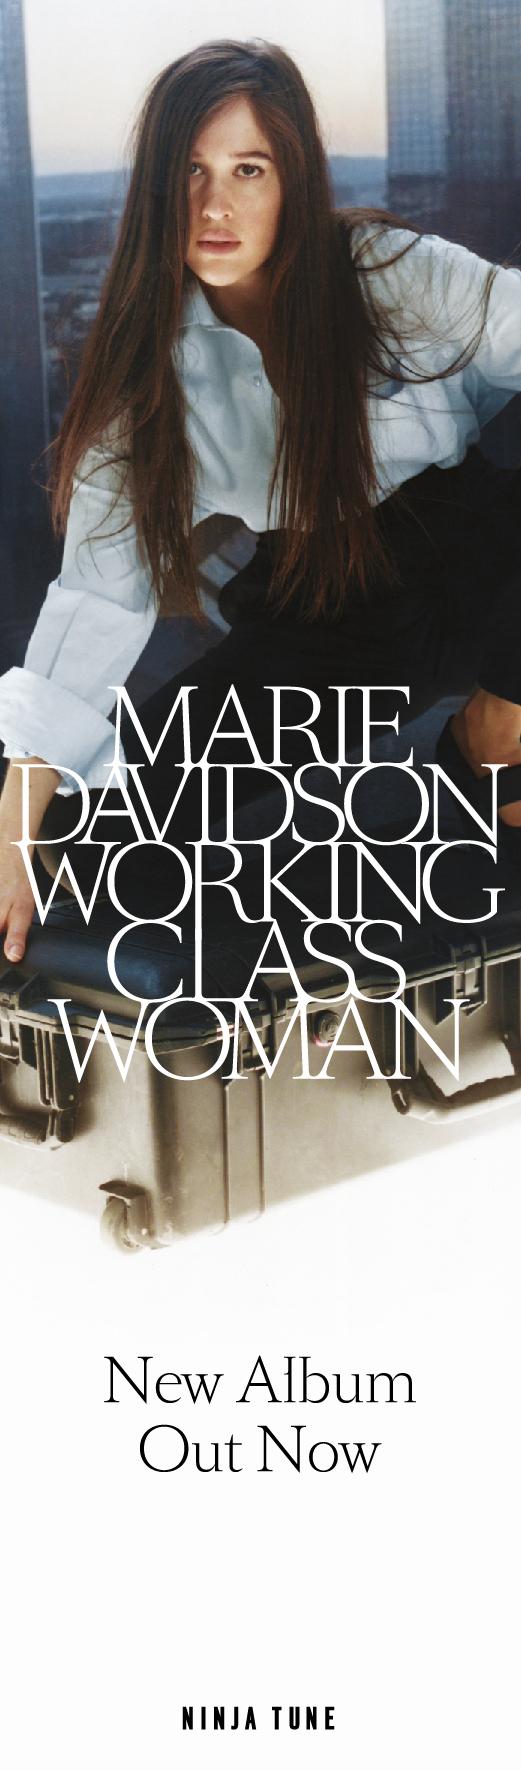 Marie Davidson Banner_Kaput Mag-05